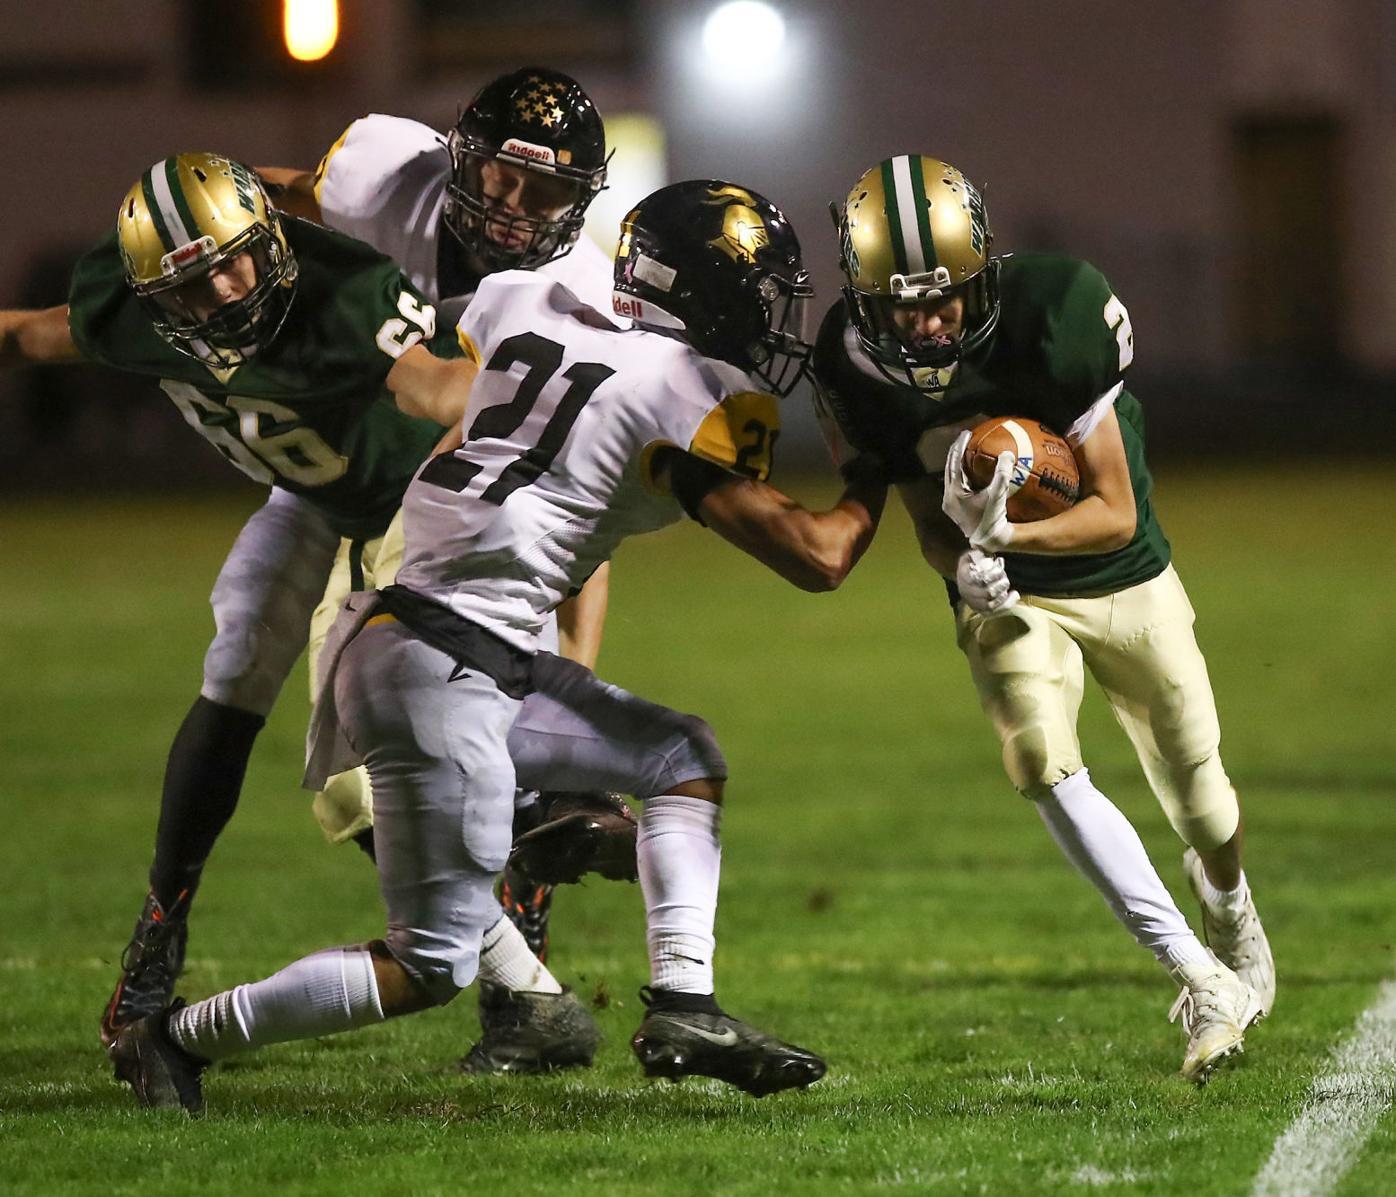 HIGH SCHOOL FOOTBALL: Wyoming Area vs Lake Lehman